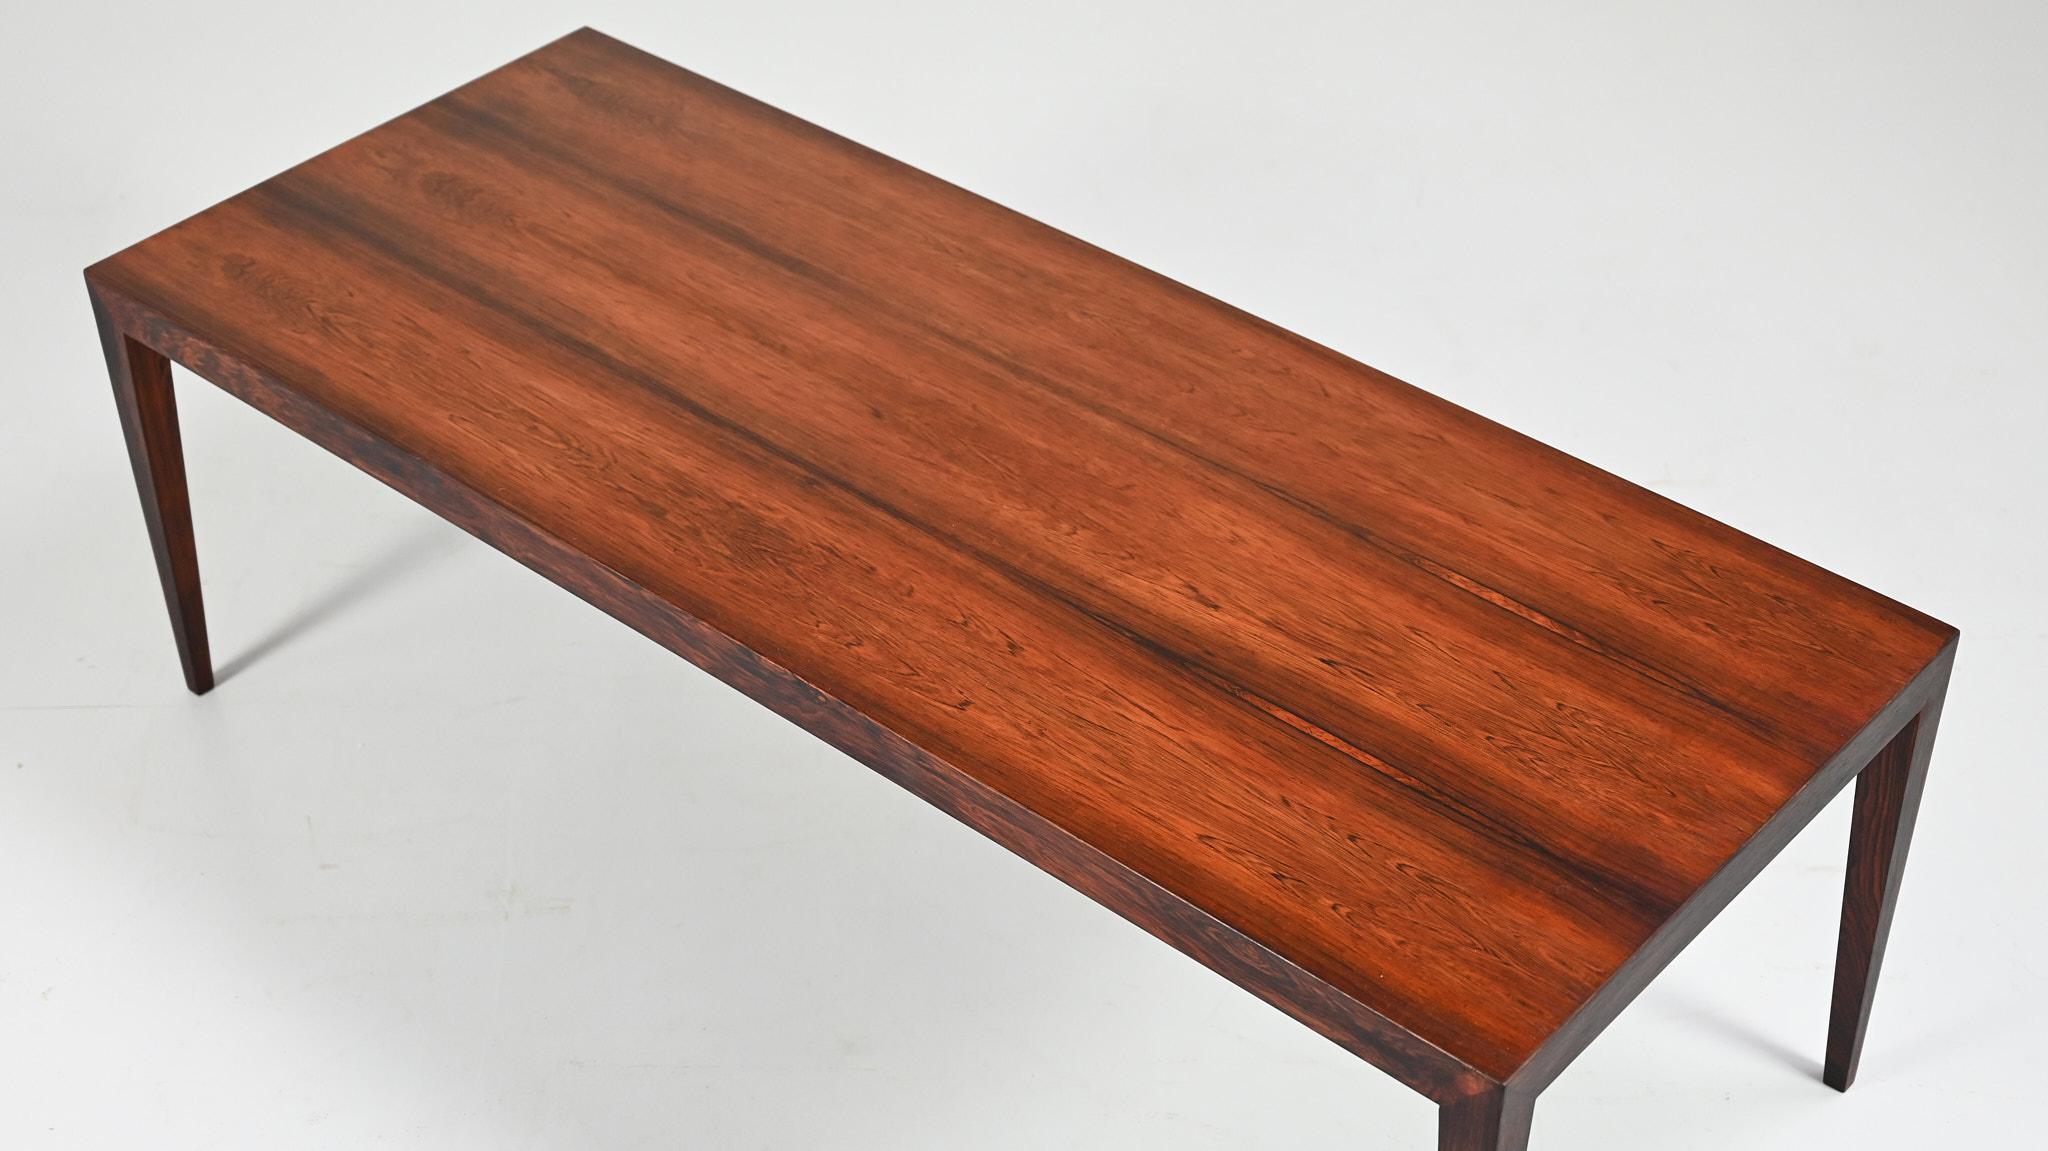 Minimalist coffee table by designer Severin Hansen Jr for Haslev Møbelsnedkeri A/S